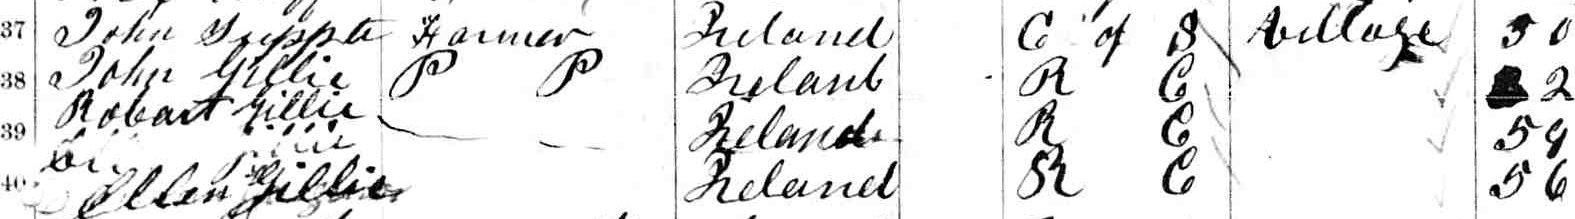 Robert Gillie, 1861 census, Pembroke, Ontario, Canada